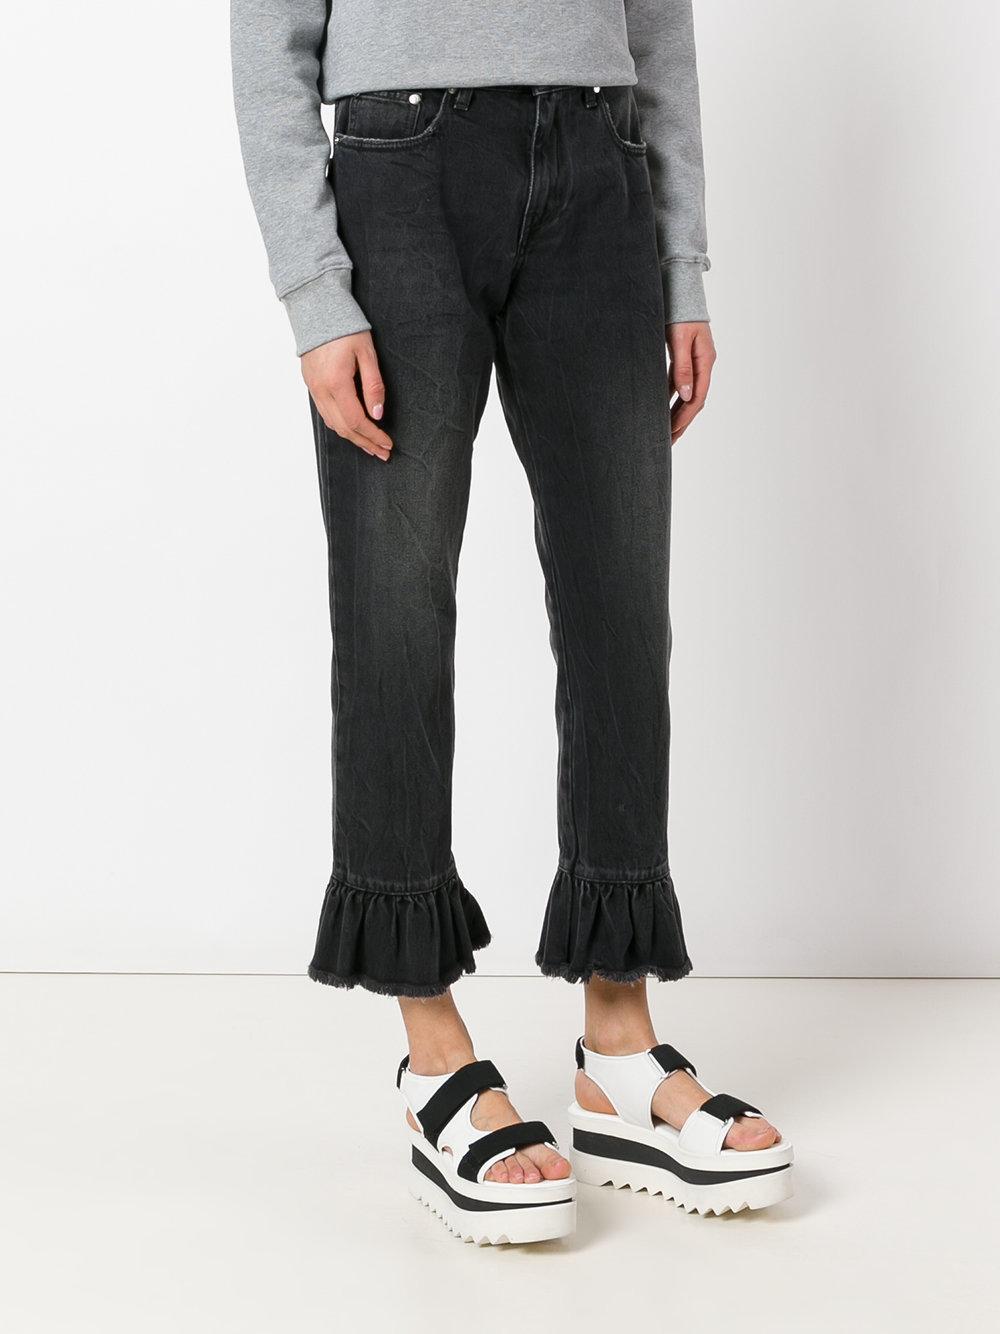 Distressed Women Jeans